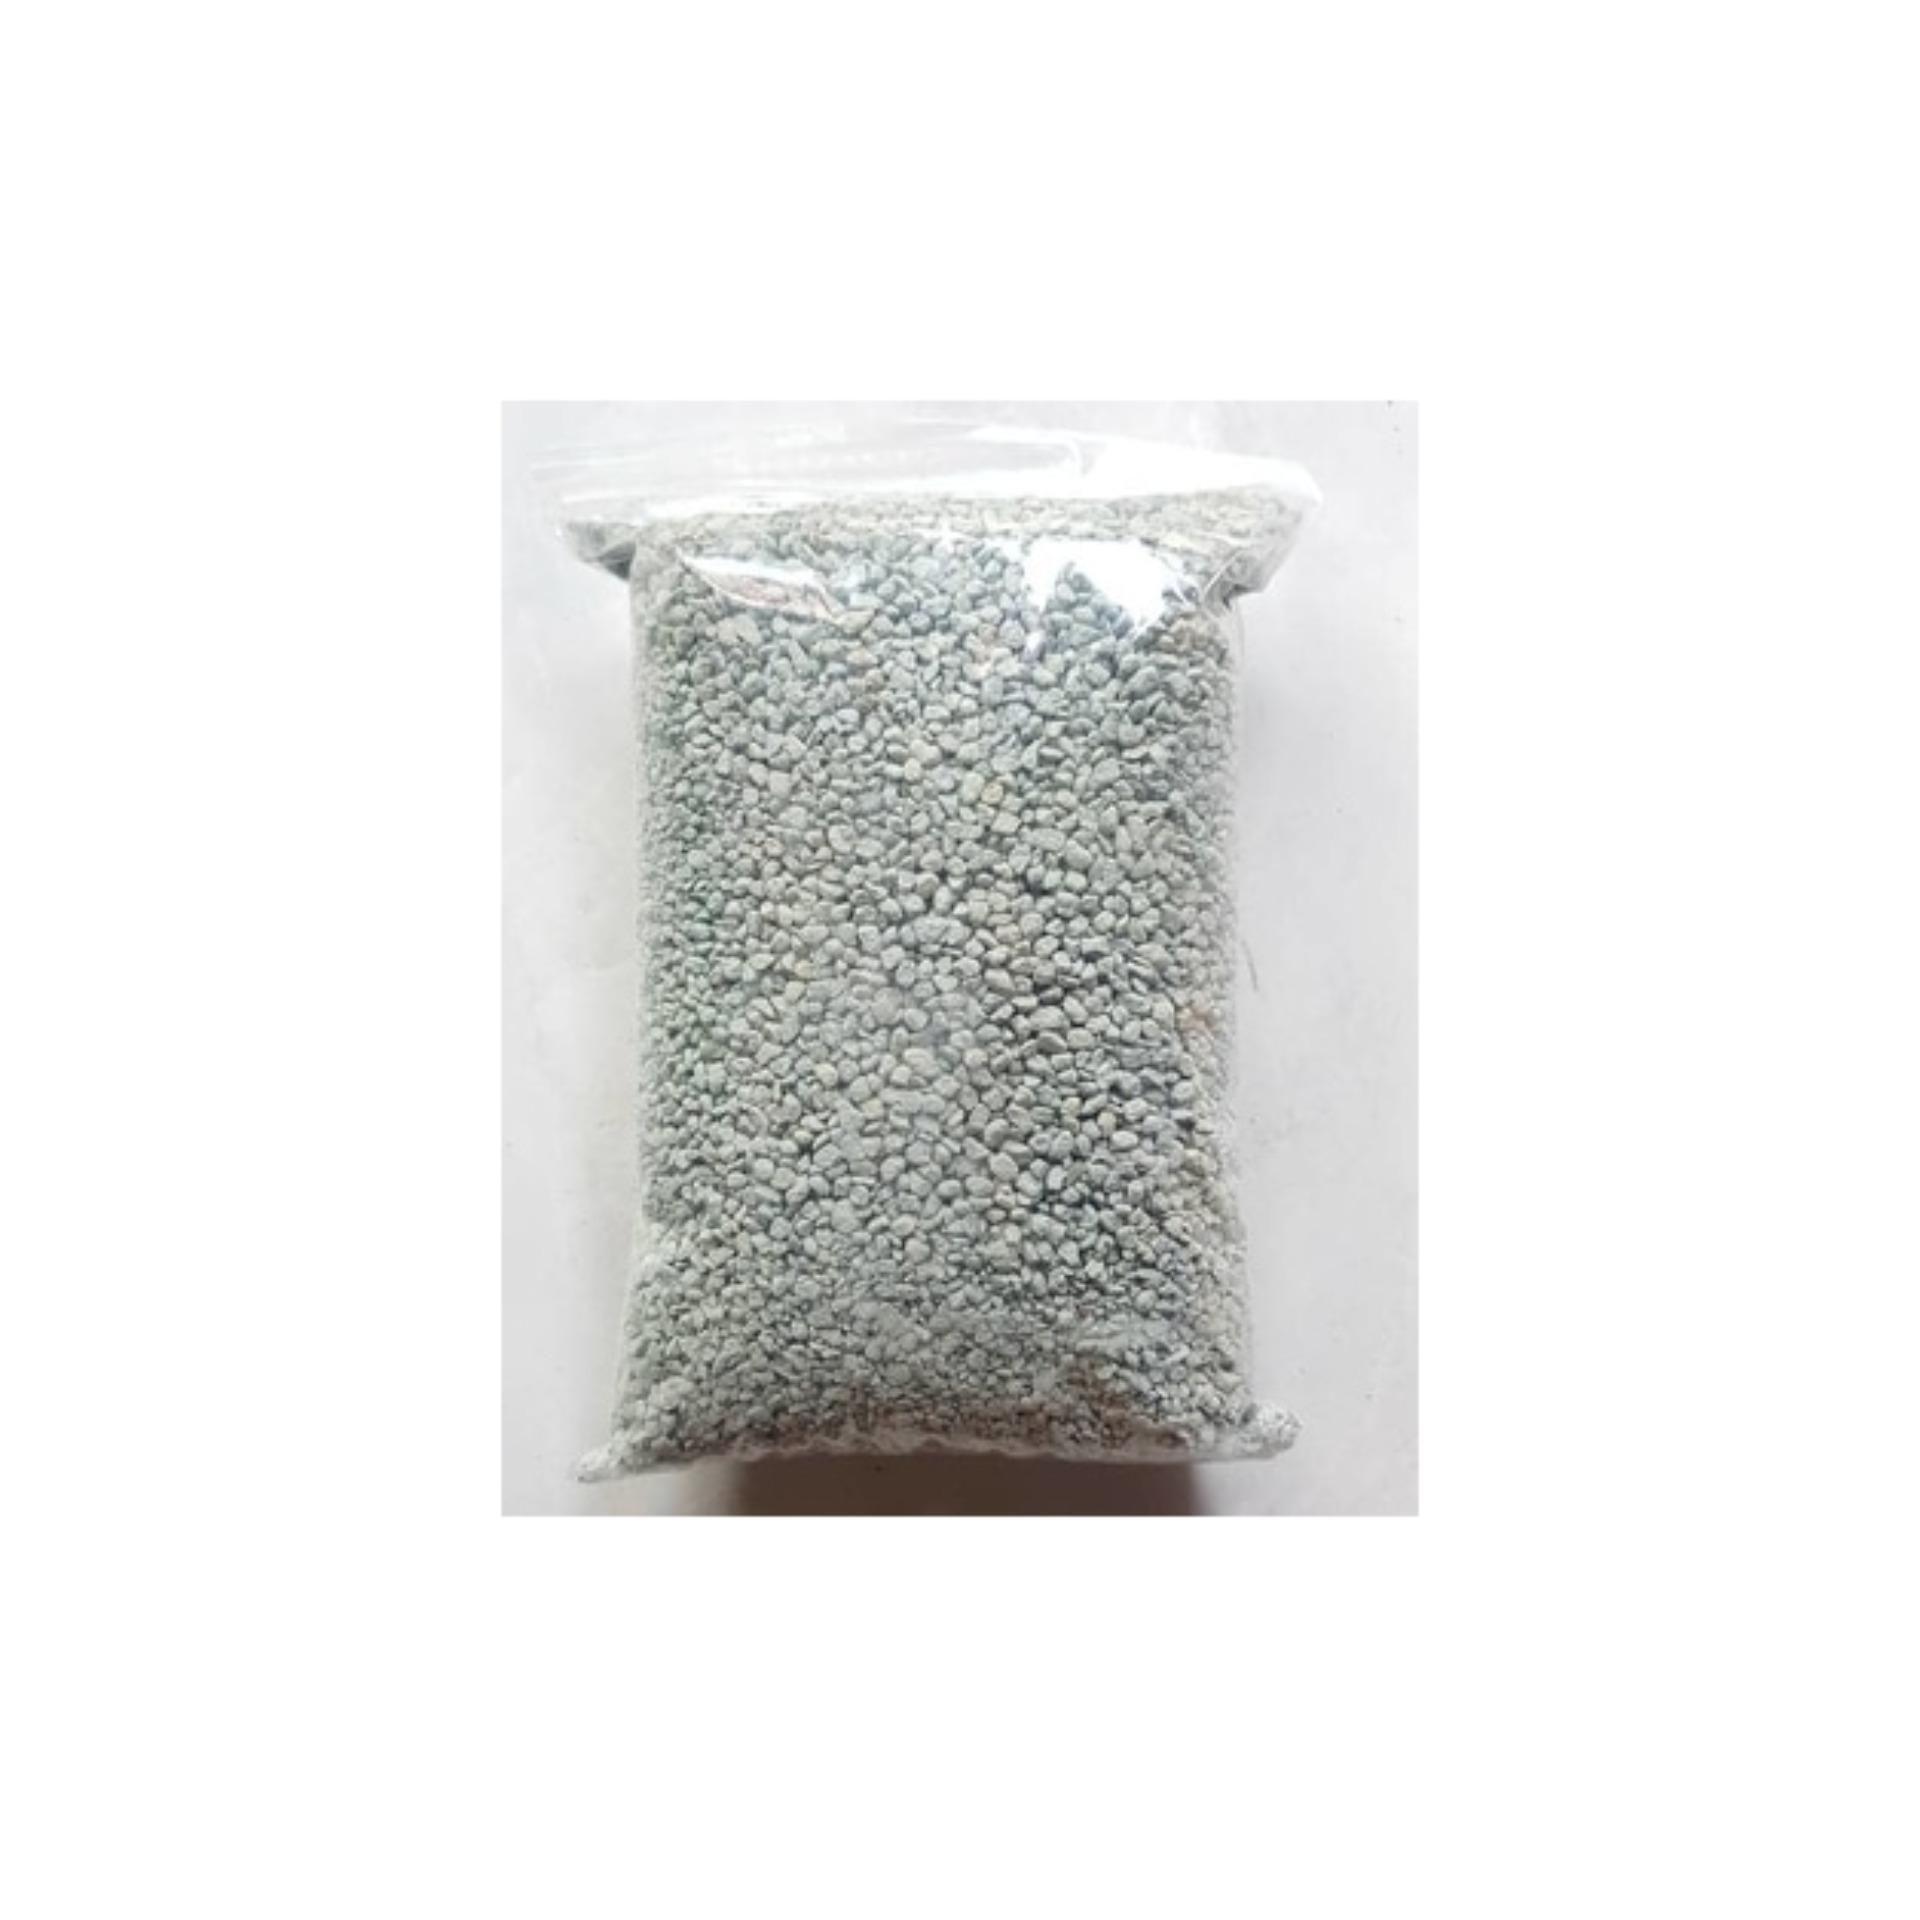 Pasir Kucing Zeolite No 2 (Repack) 1 kgIDR4500. Rp 4.500